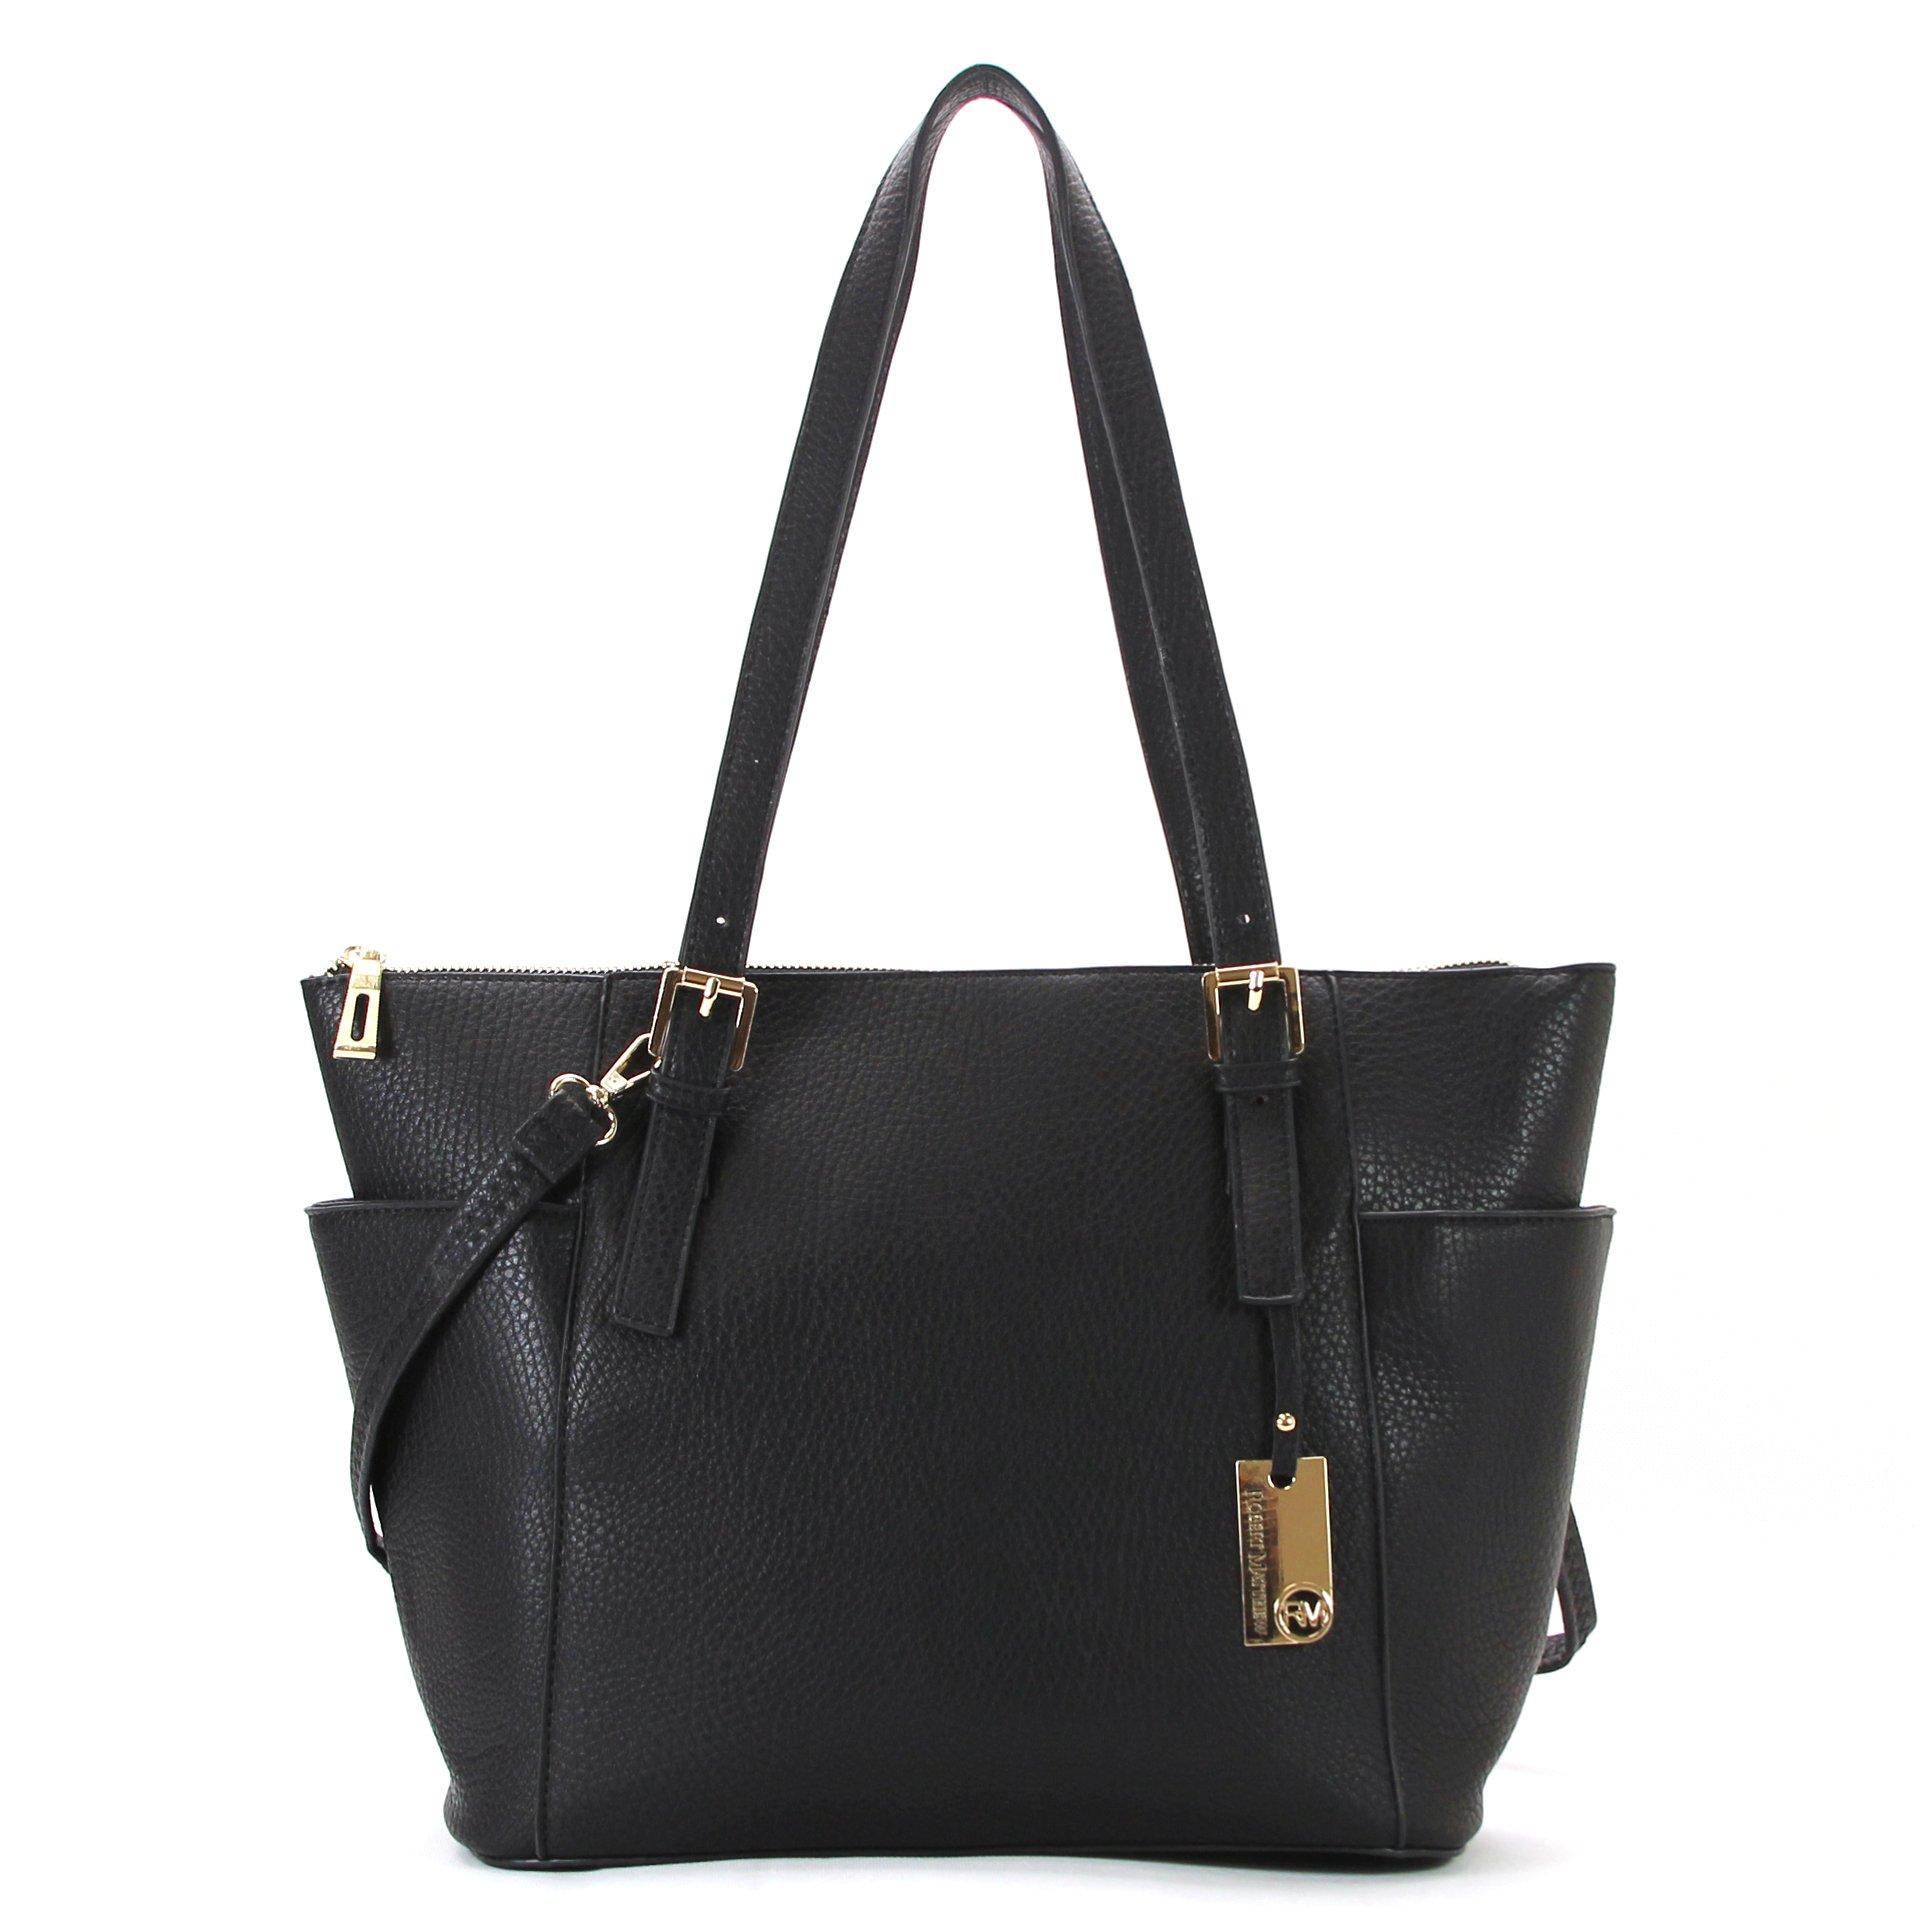 Robert Matthew Fashion Khloe Womens Tote Bag, Designer Black Pu Leather Purses by Robert Matthew